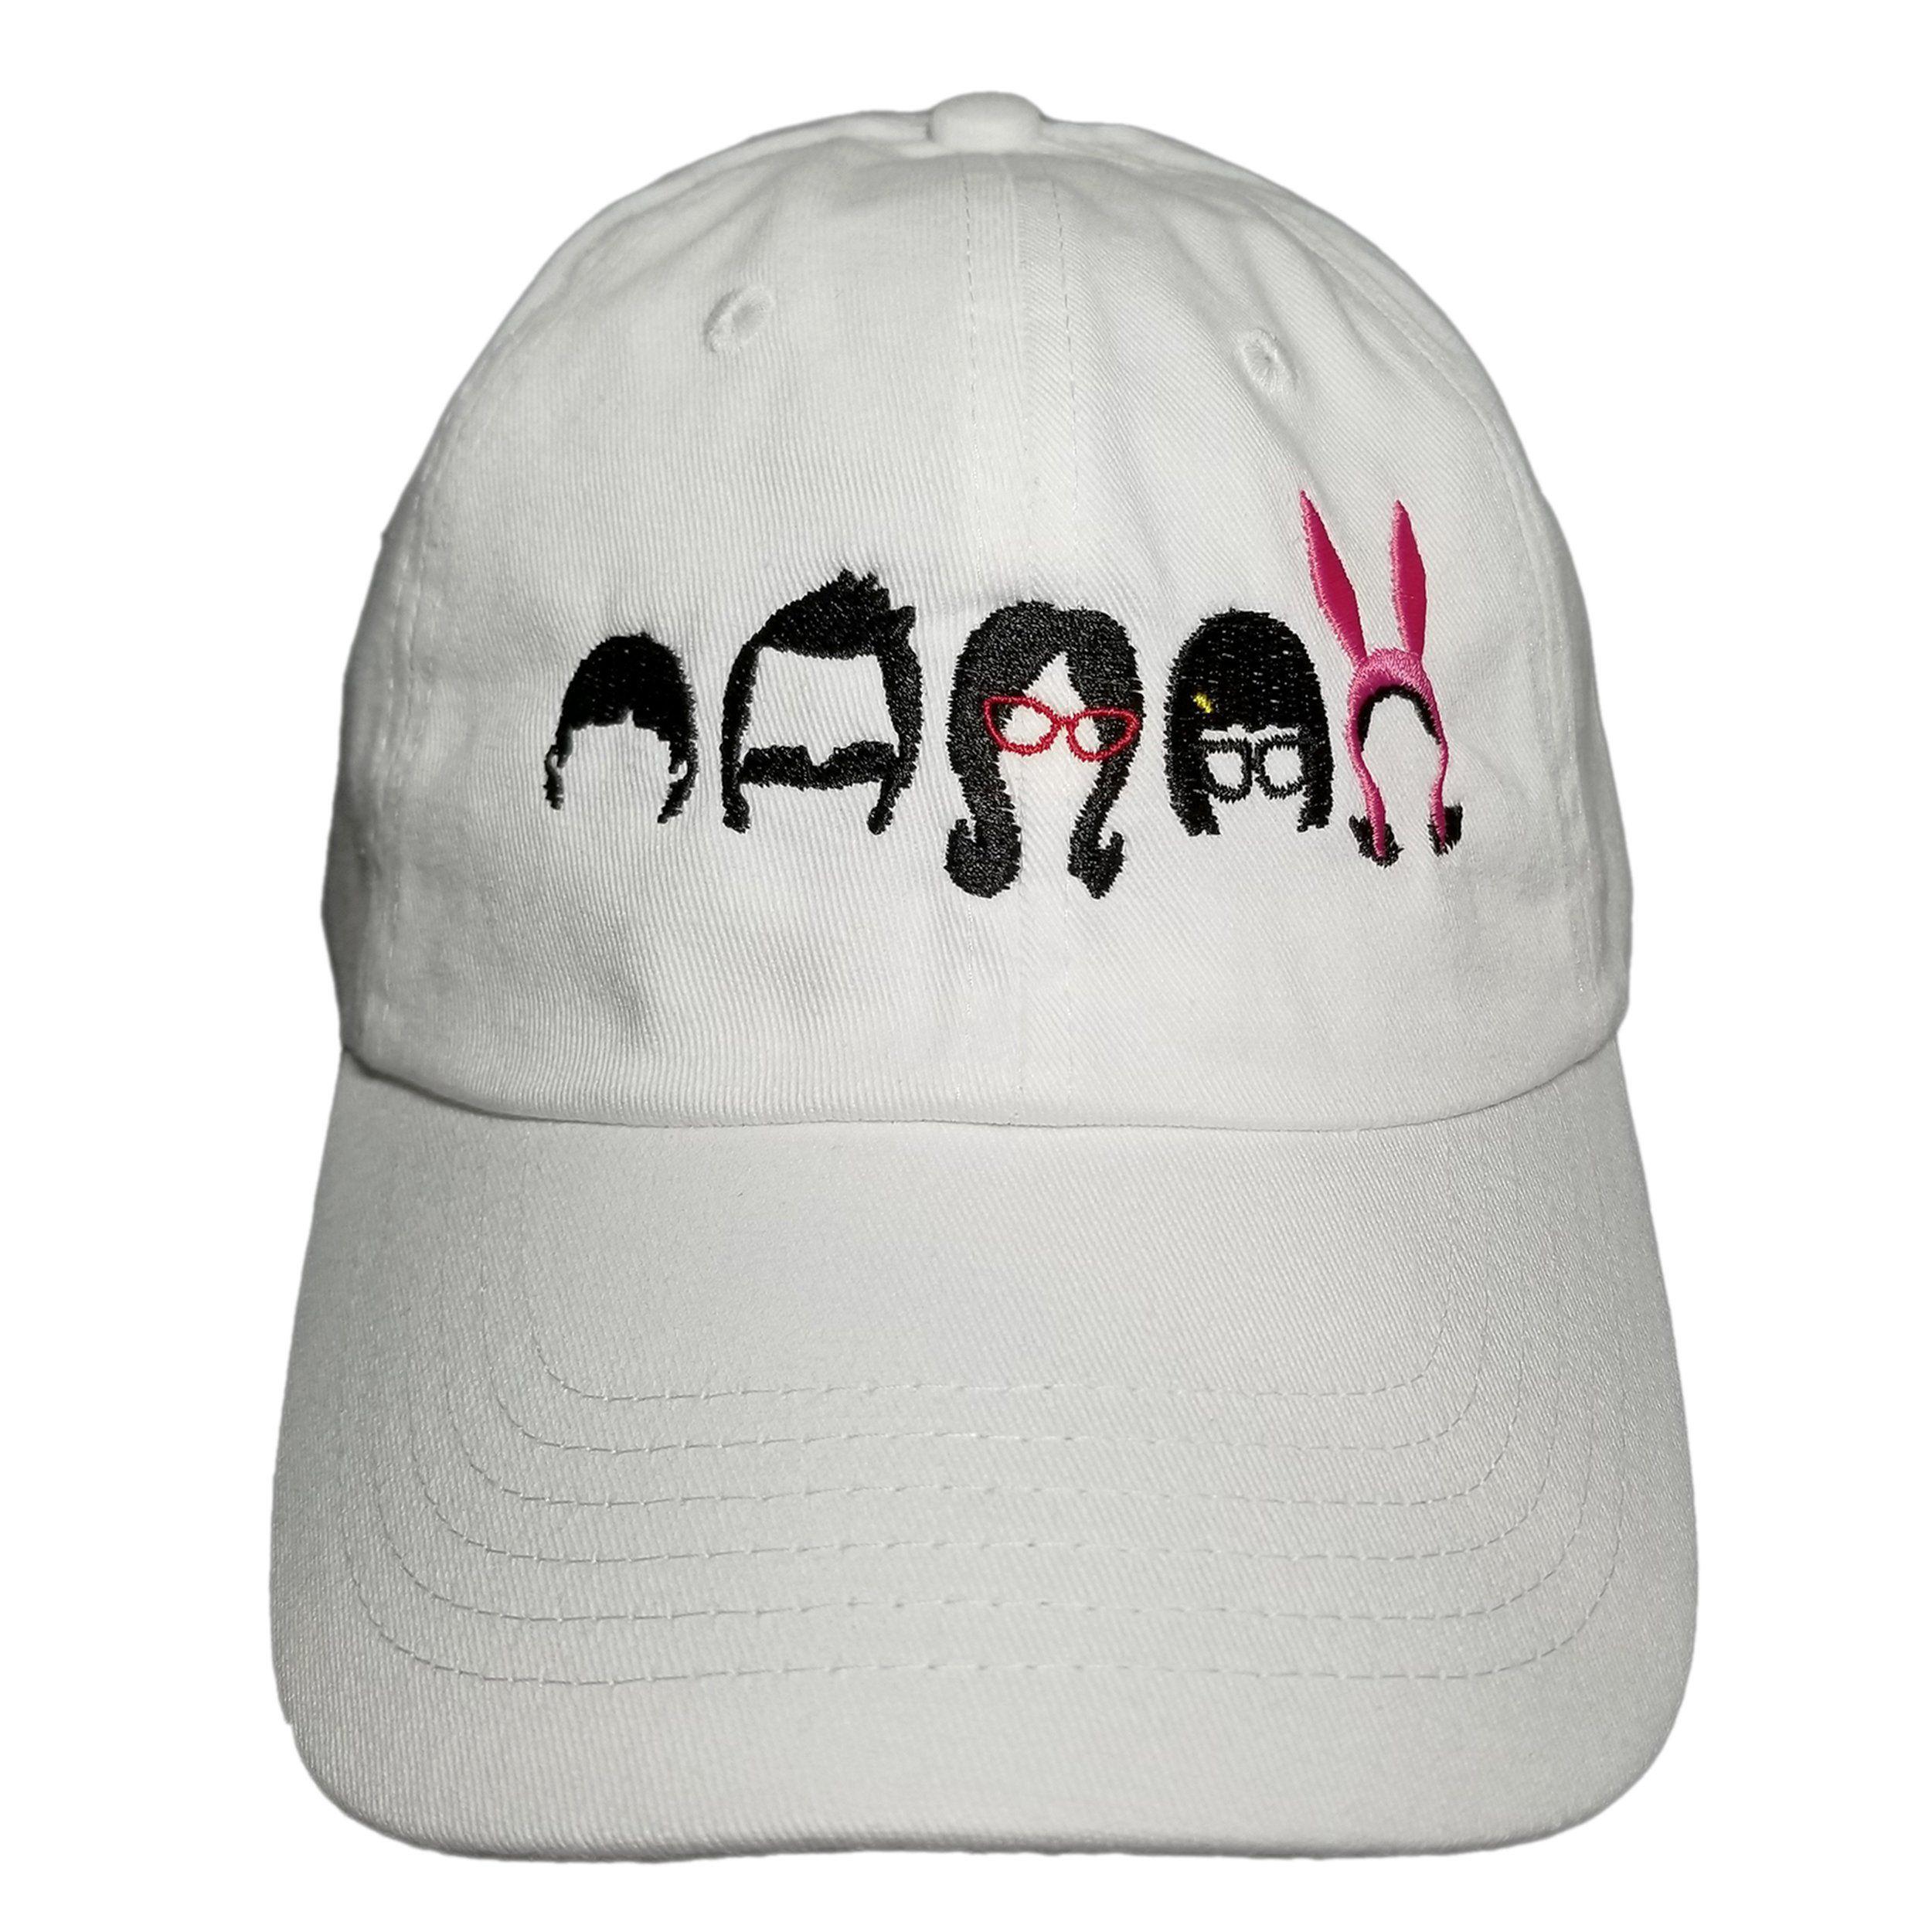 f967d3129f2 Shop Bob s Burgers Hat from Hats 4 U in Hats